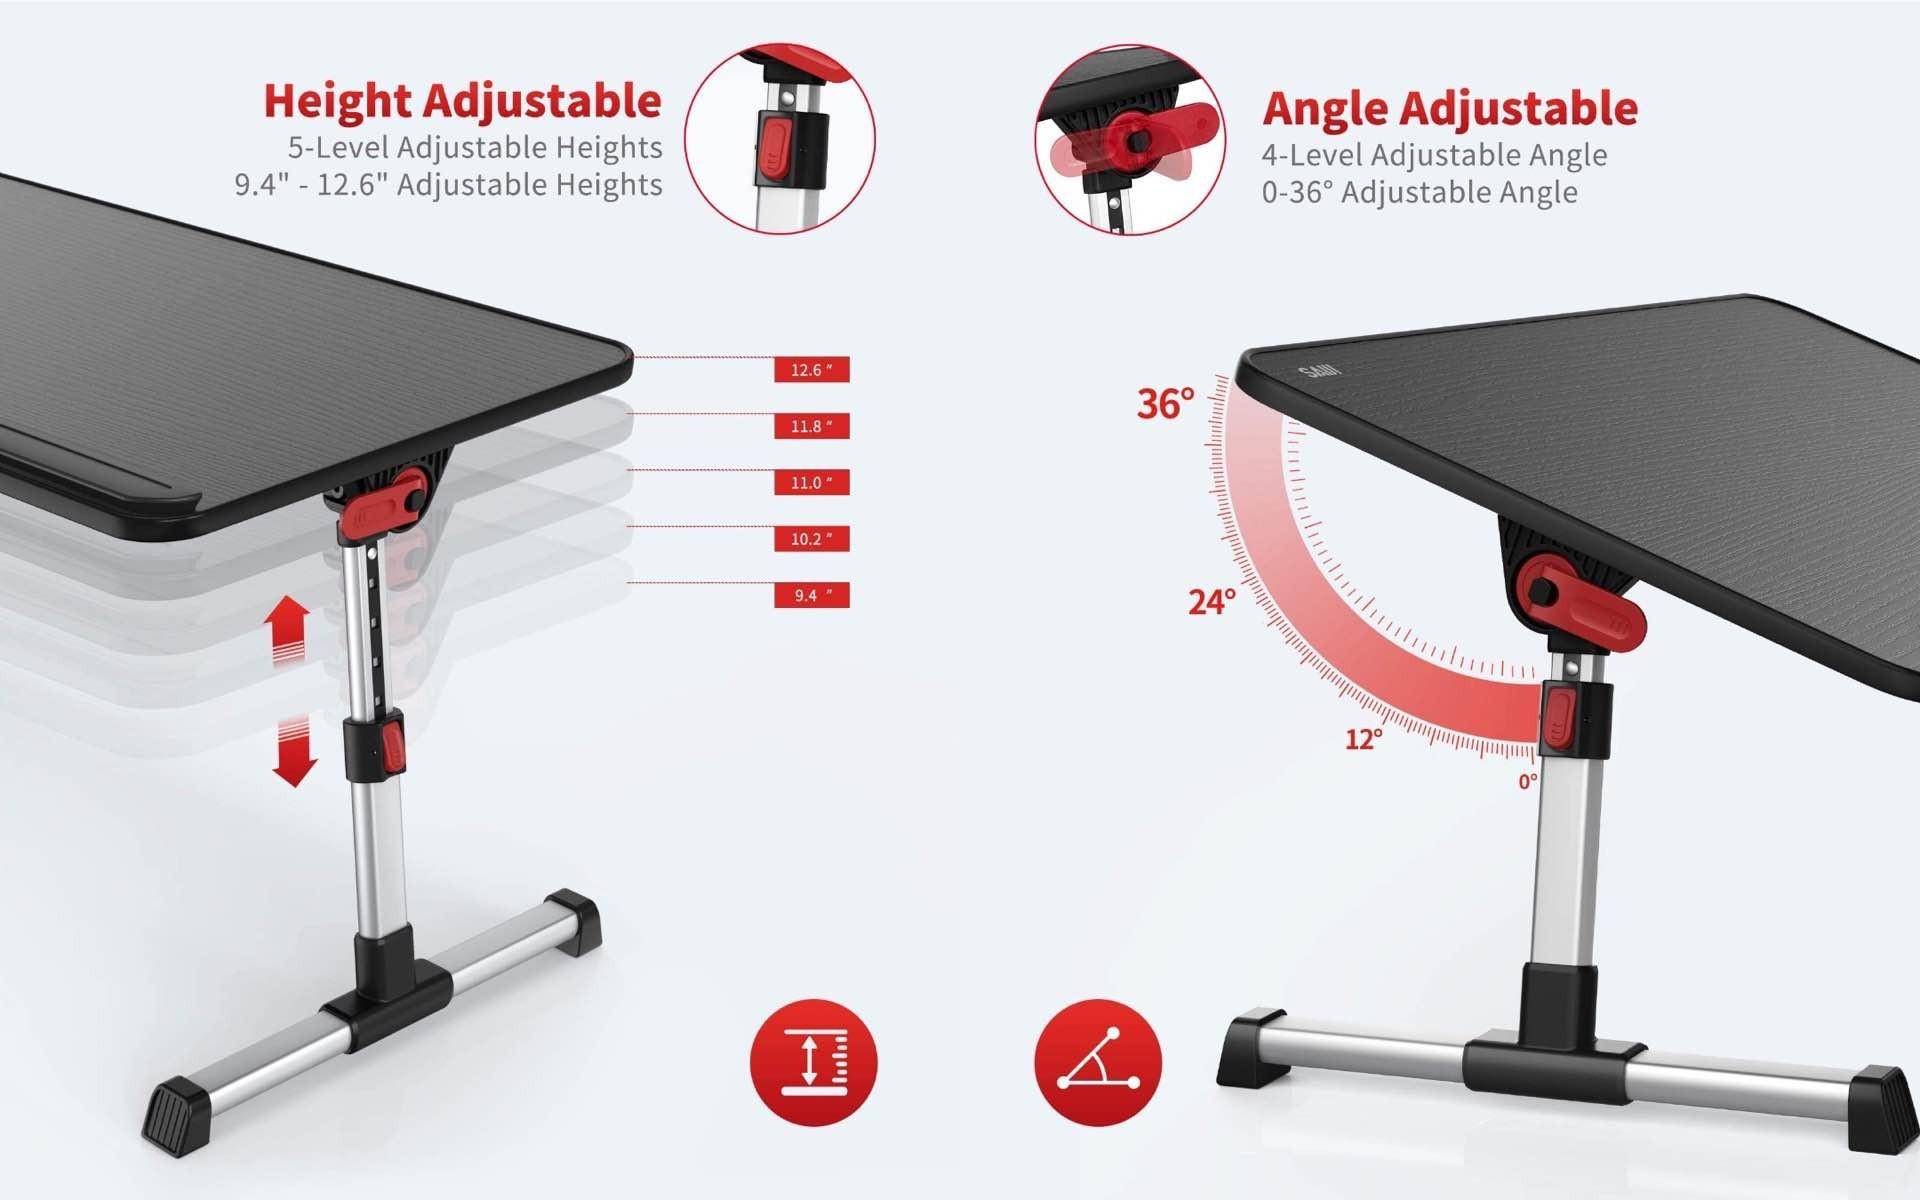 saiji-adjustable-laptop-stand-portable-standing-desk-bed-tray-table-adjustments